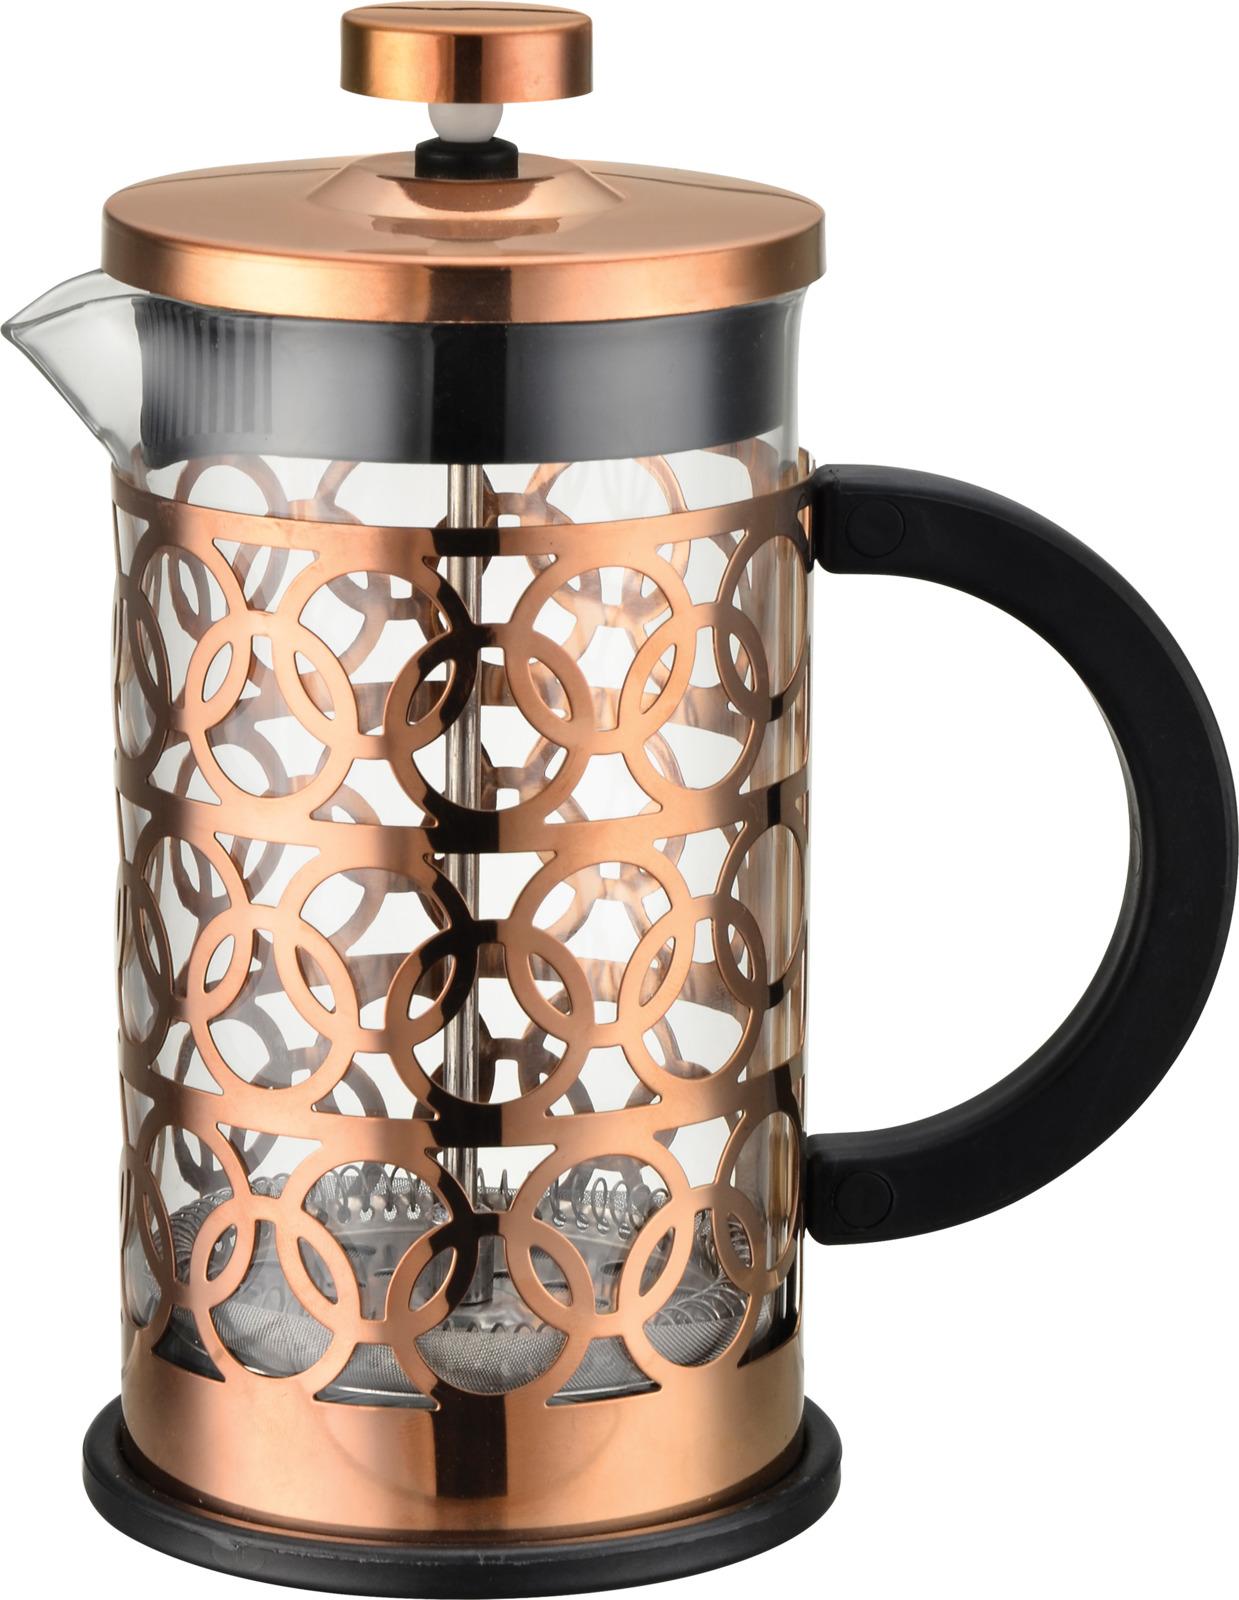 Кофе-пресс стеклянный Mallony Bronzo, 600 мл